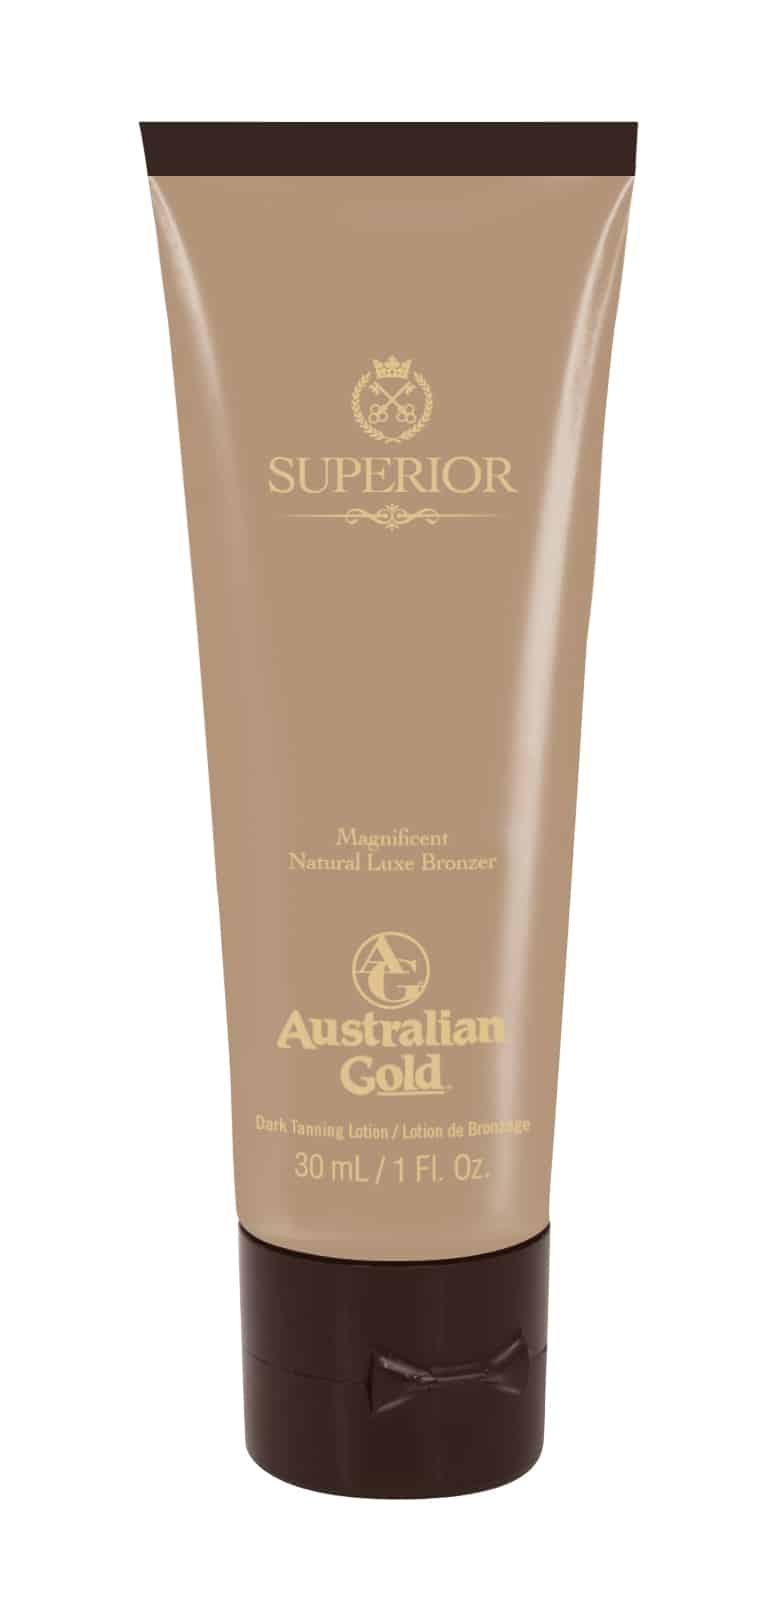 Australian Gold Сыворотка-Активатор с Комплексом Корректирующих Бронзаторов Класса Люкс Superior Natural Bronzer, 28,5 мл